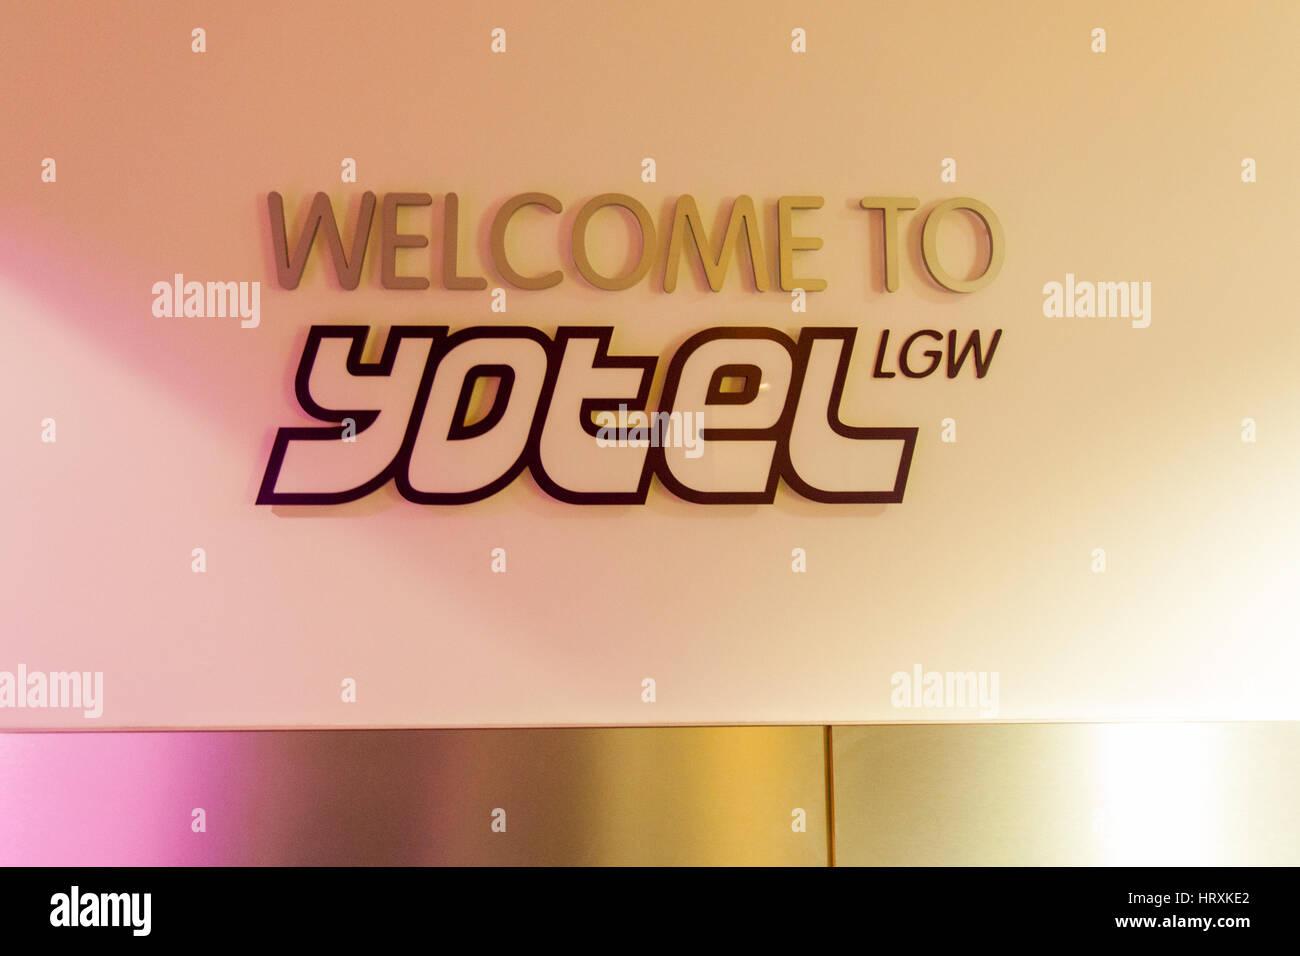 Yotel pod or capsule hotel, Gatwick Airport, England, United Kingdom. - Stock Image